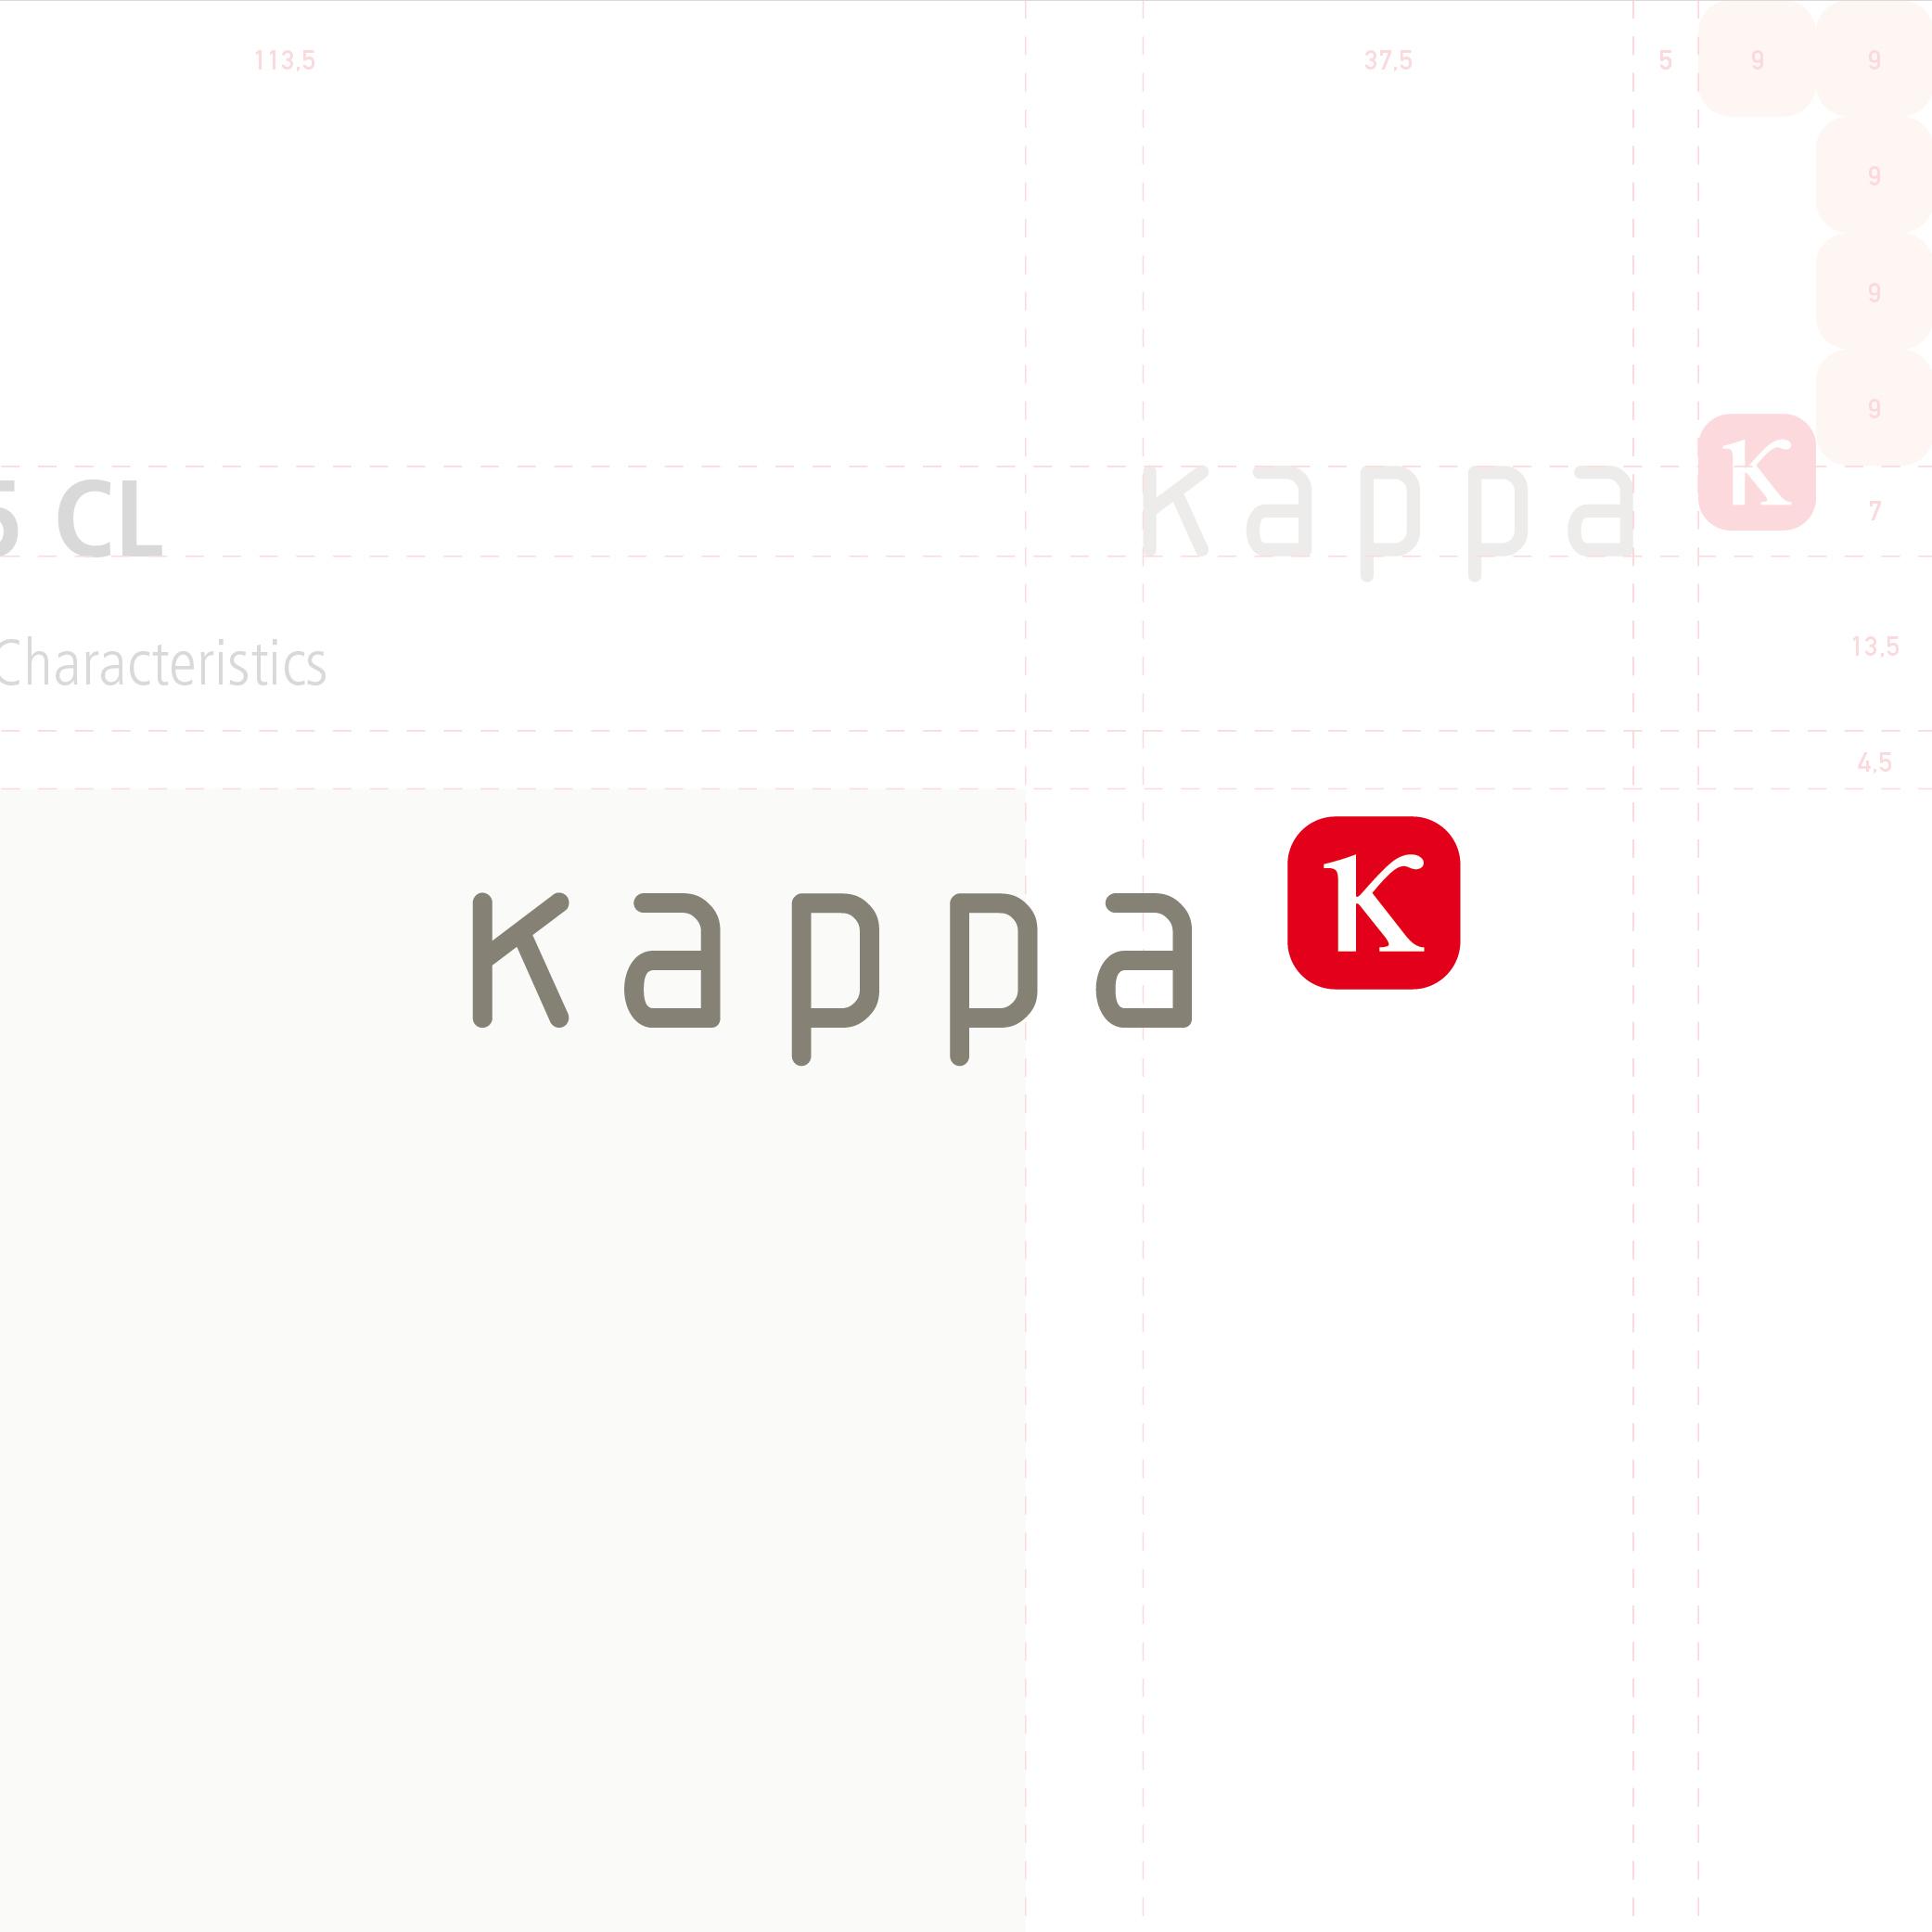 Kappa Klein Lengden, Wort-Bildmarke